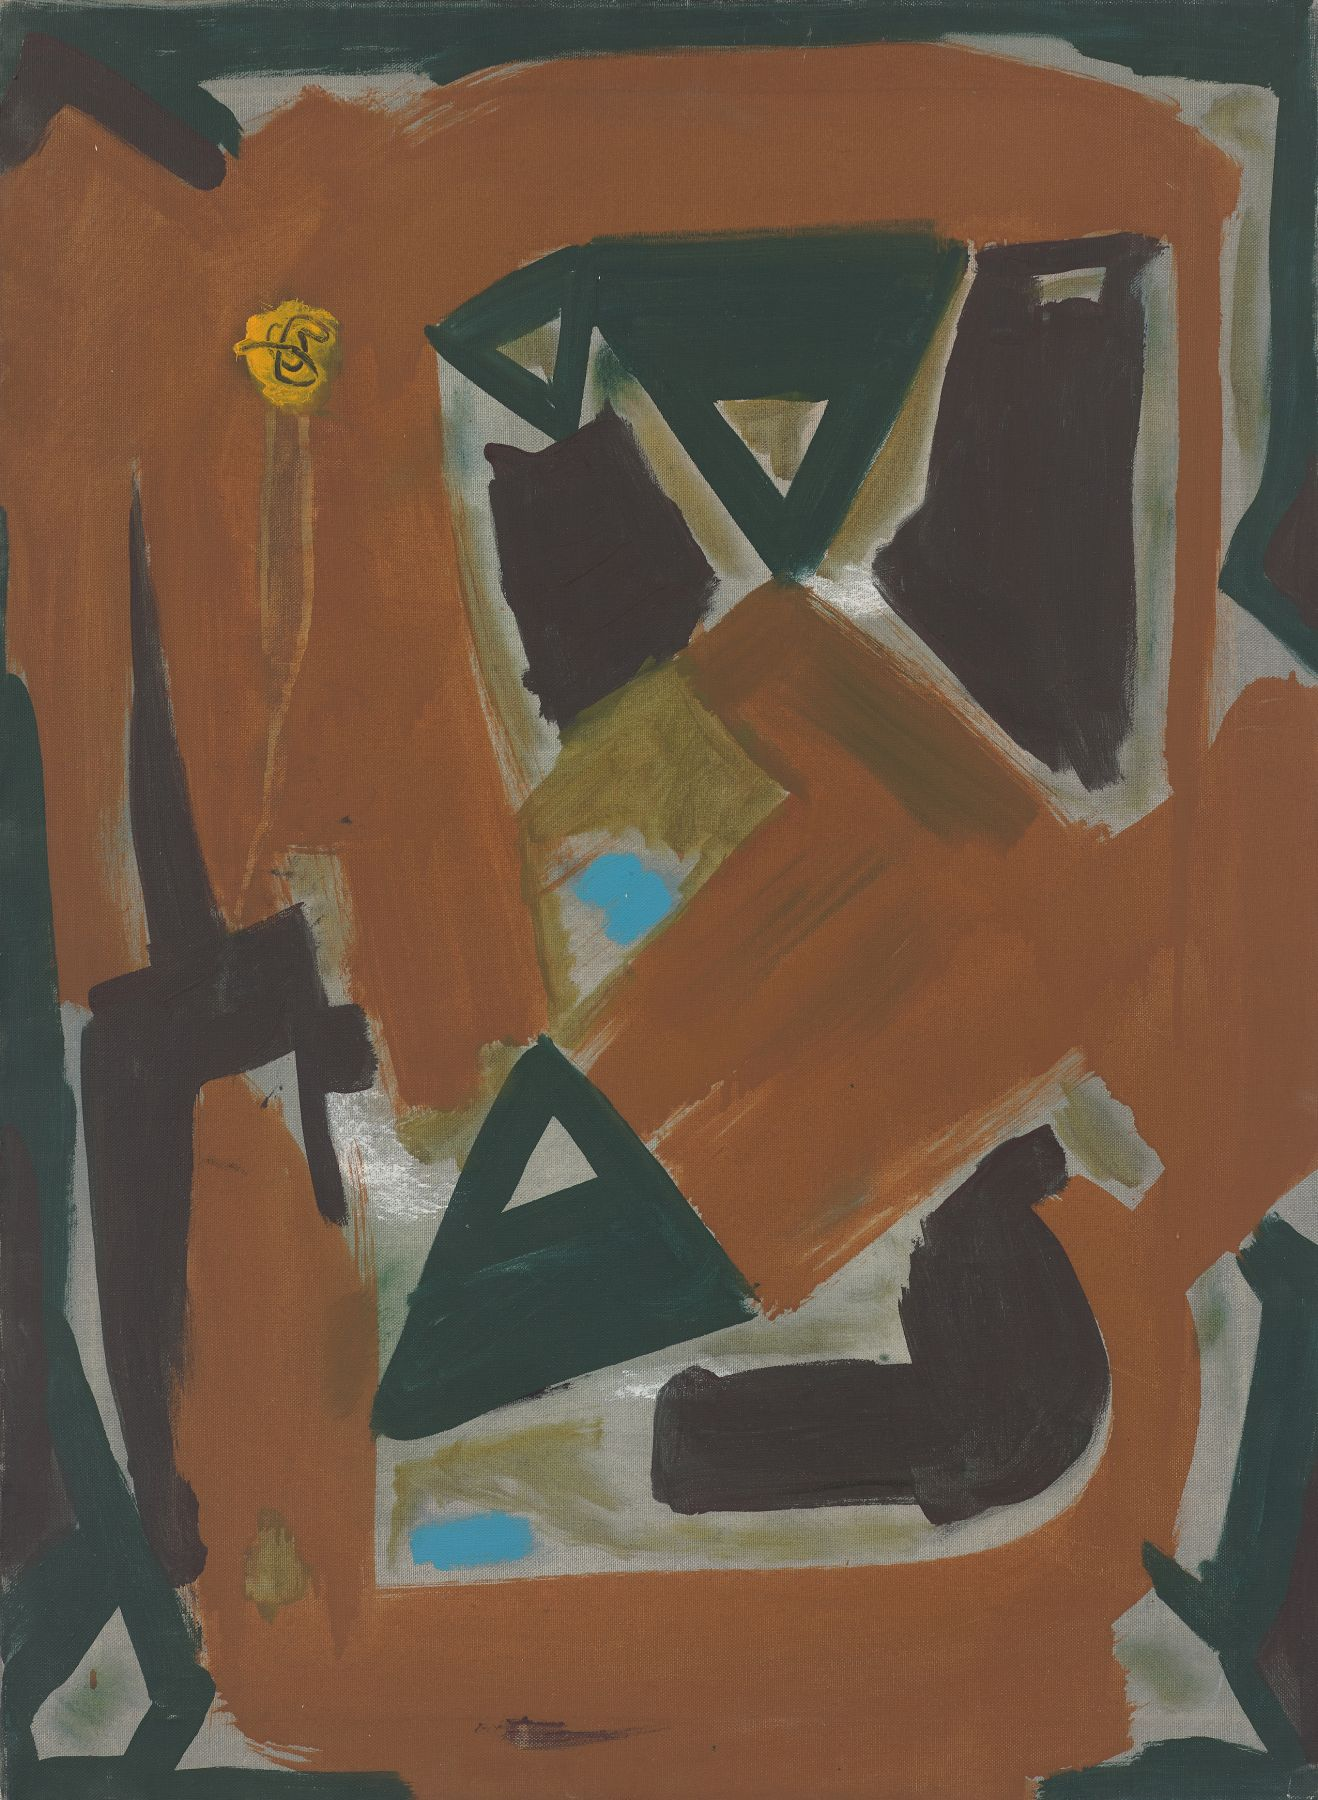 Sputnik (1961) Oil on canvas